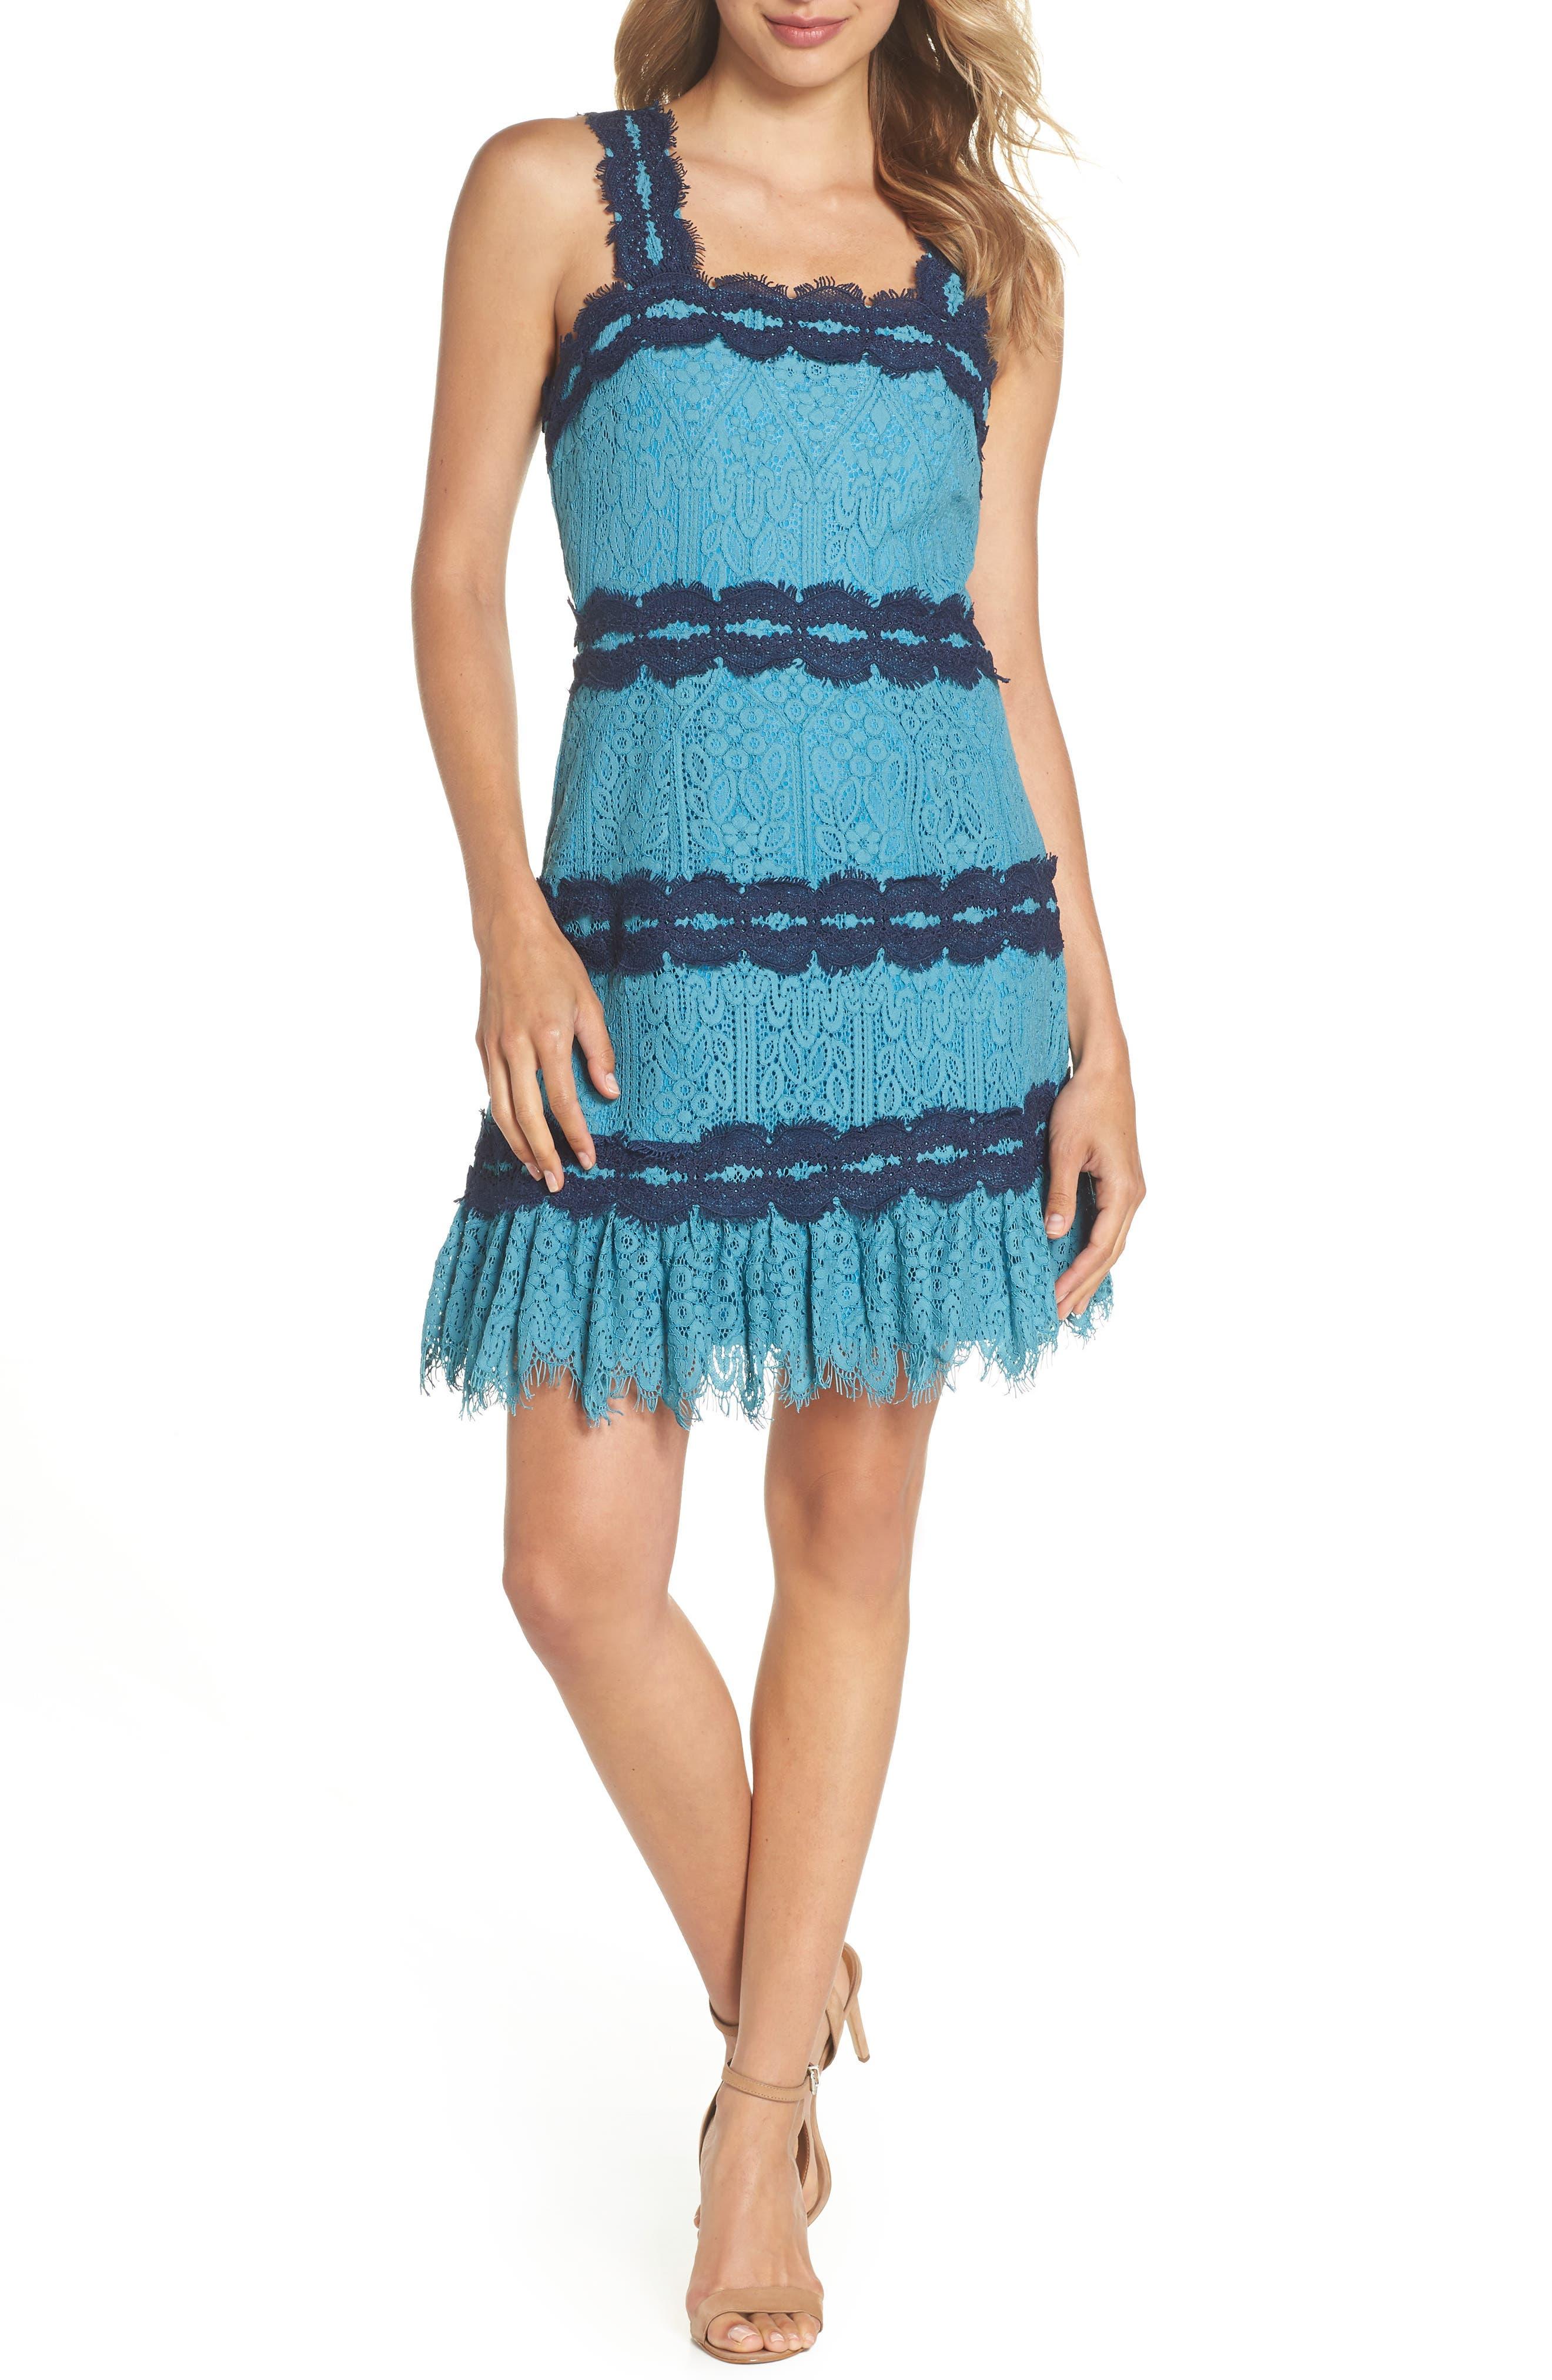 Lula Ruffle Lace Dress,                         Main,                         color, TEAL/ NAVY